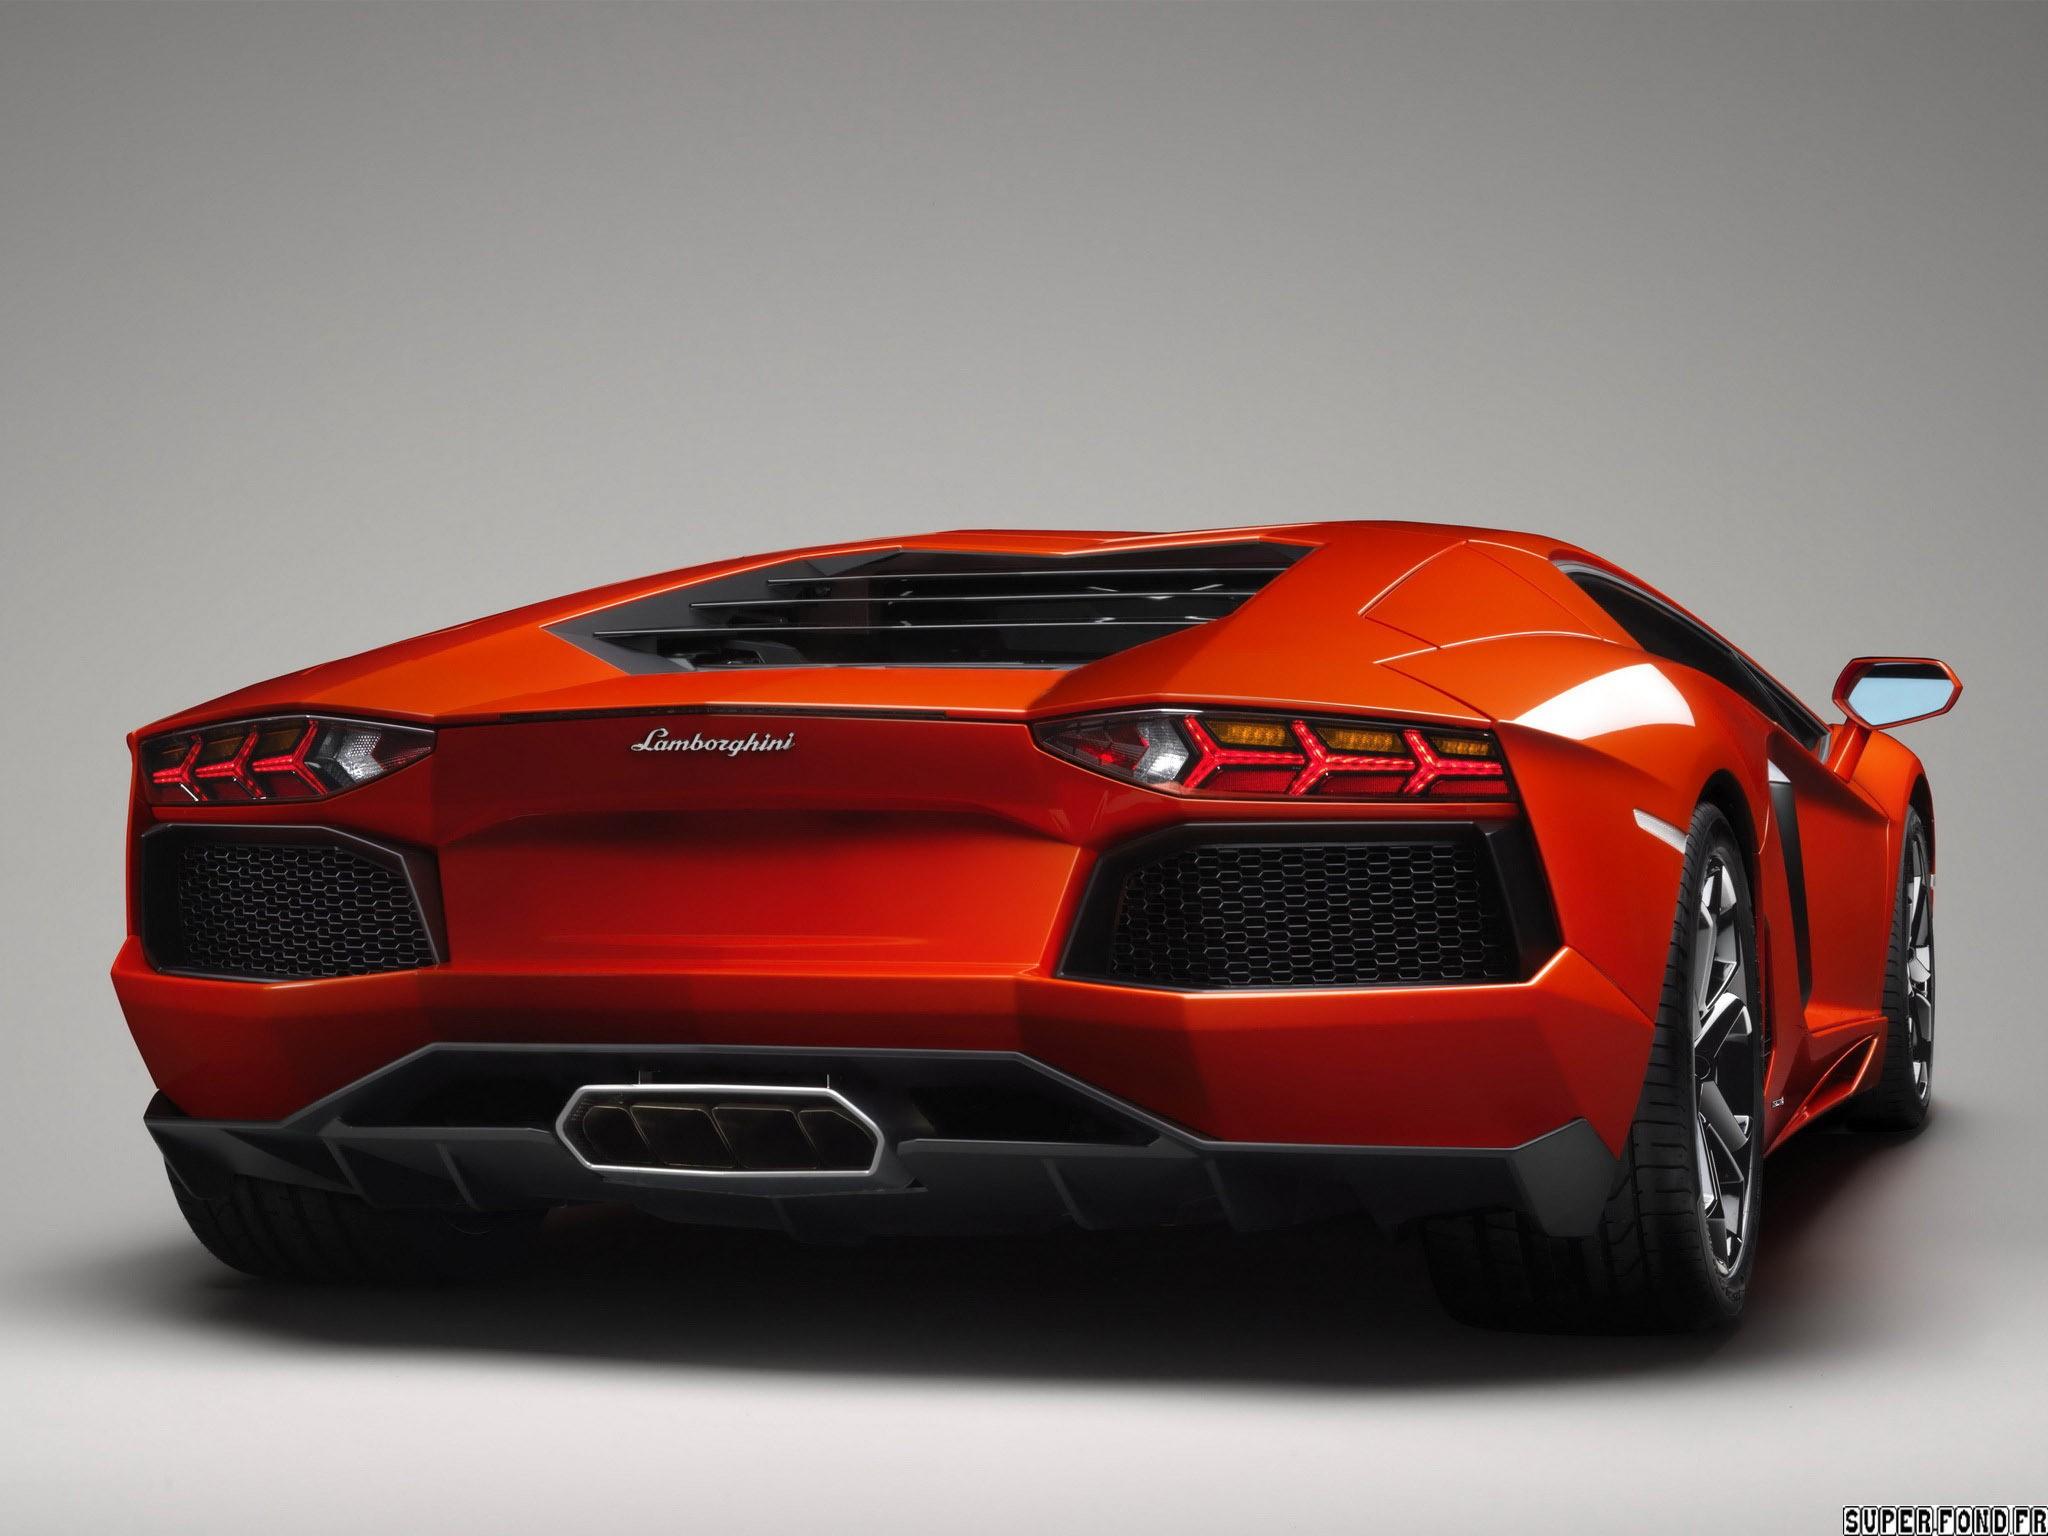 Lamborghini Aventador lp700 2011